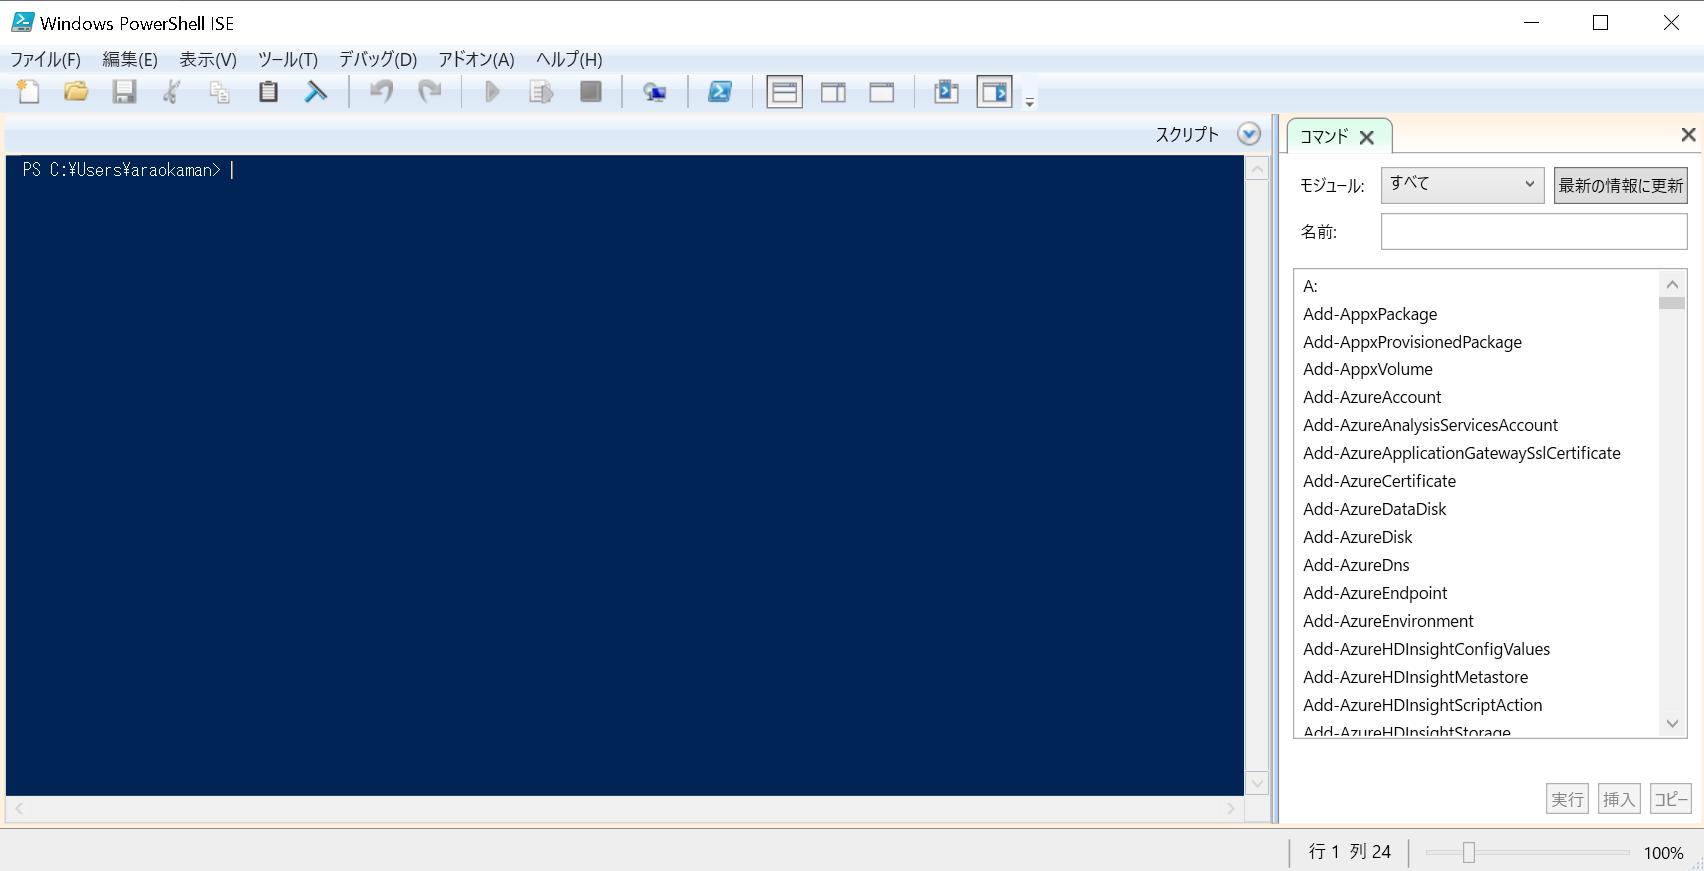 Windows PowerShell ISEの画面